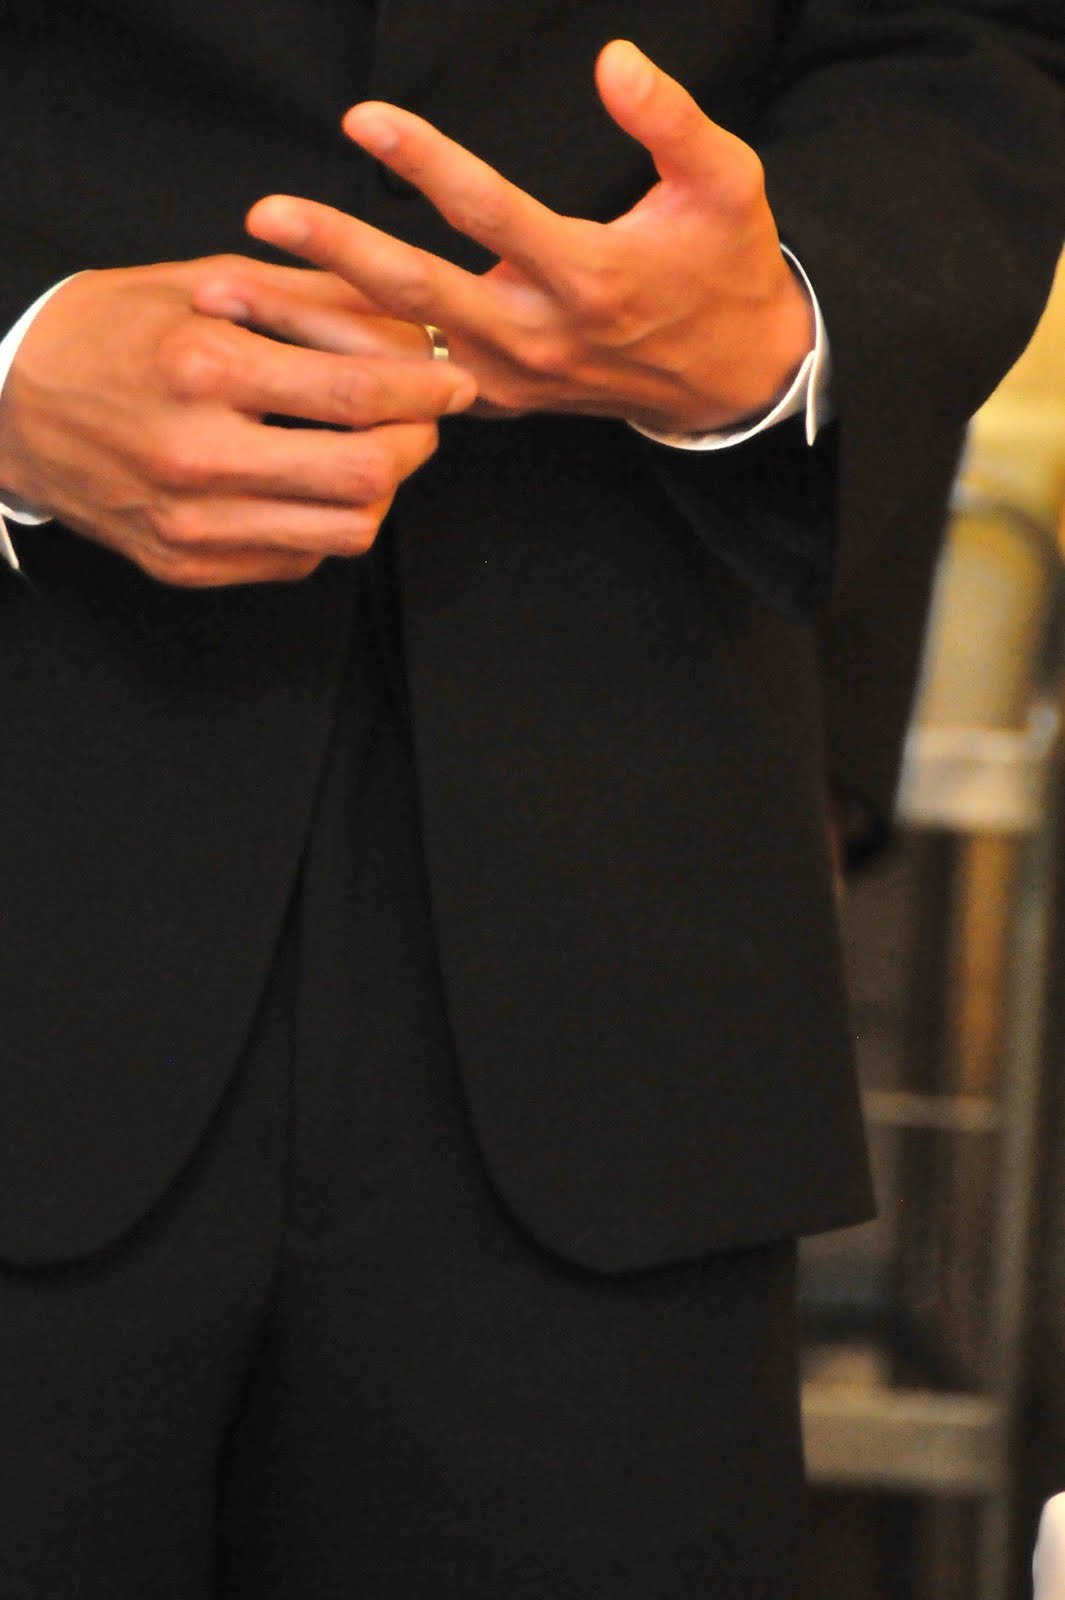 chinese wedding rings